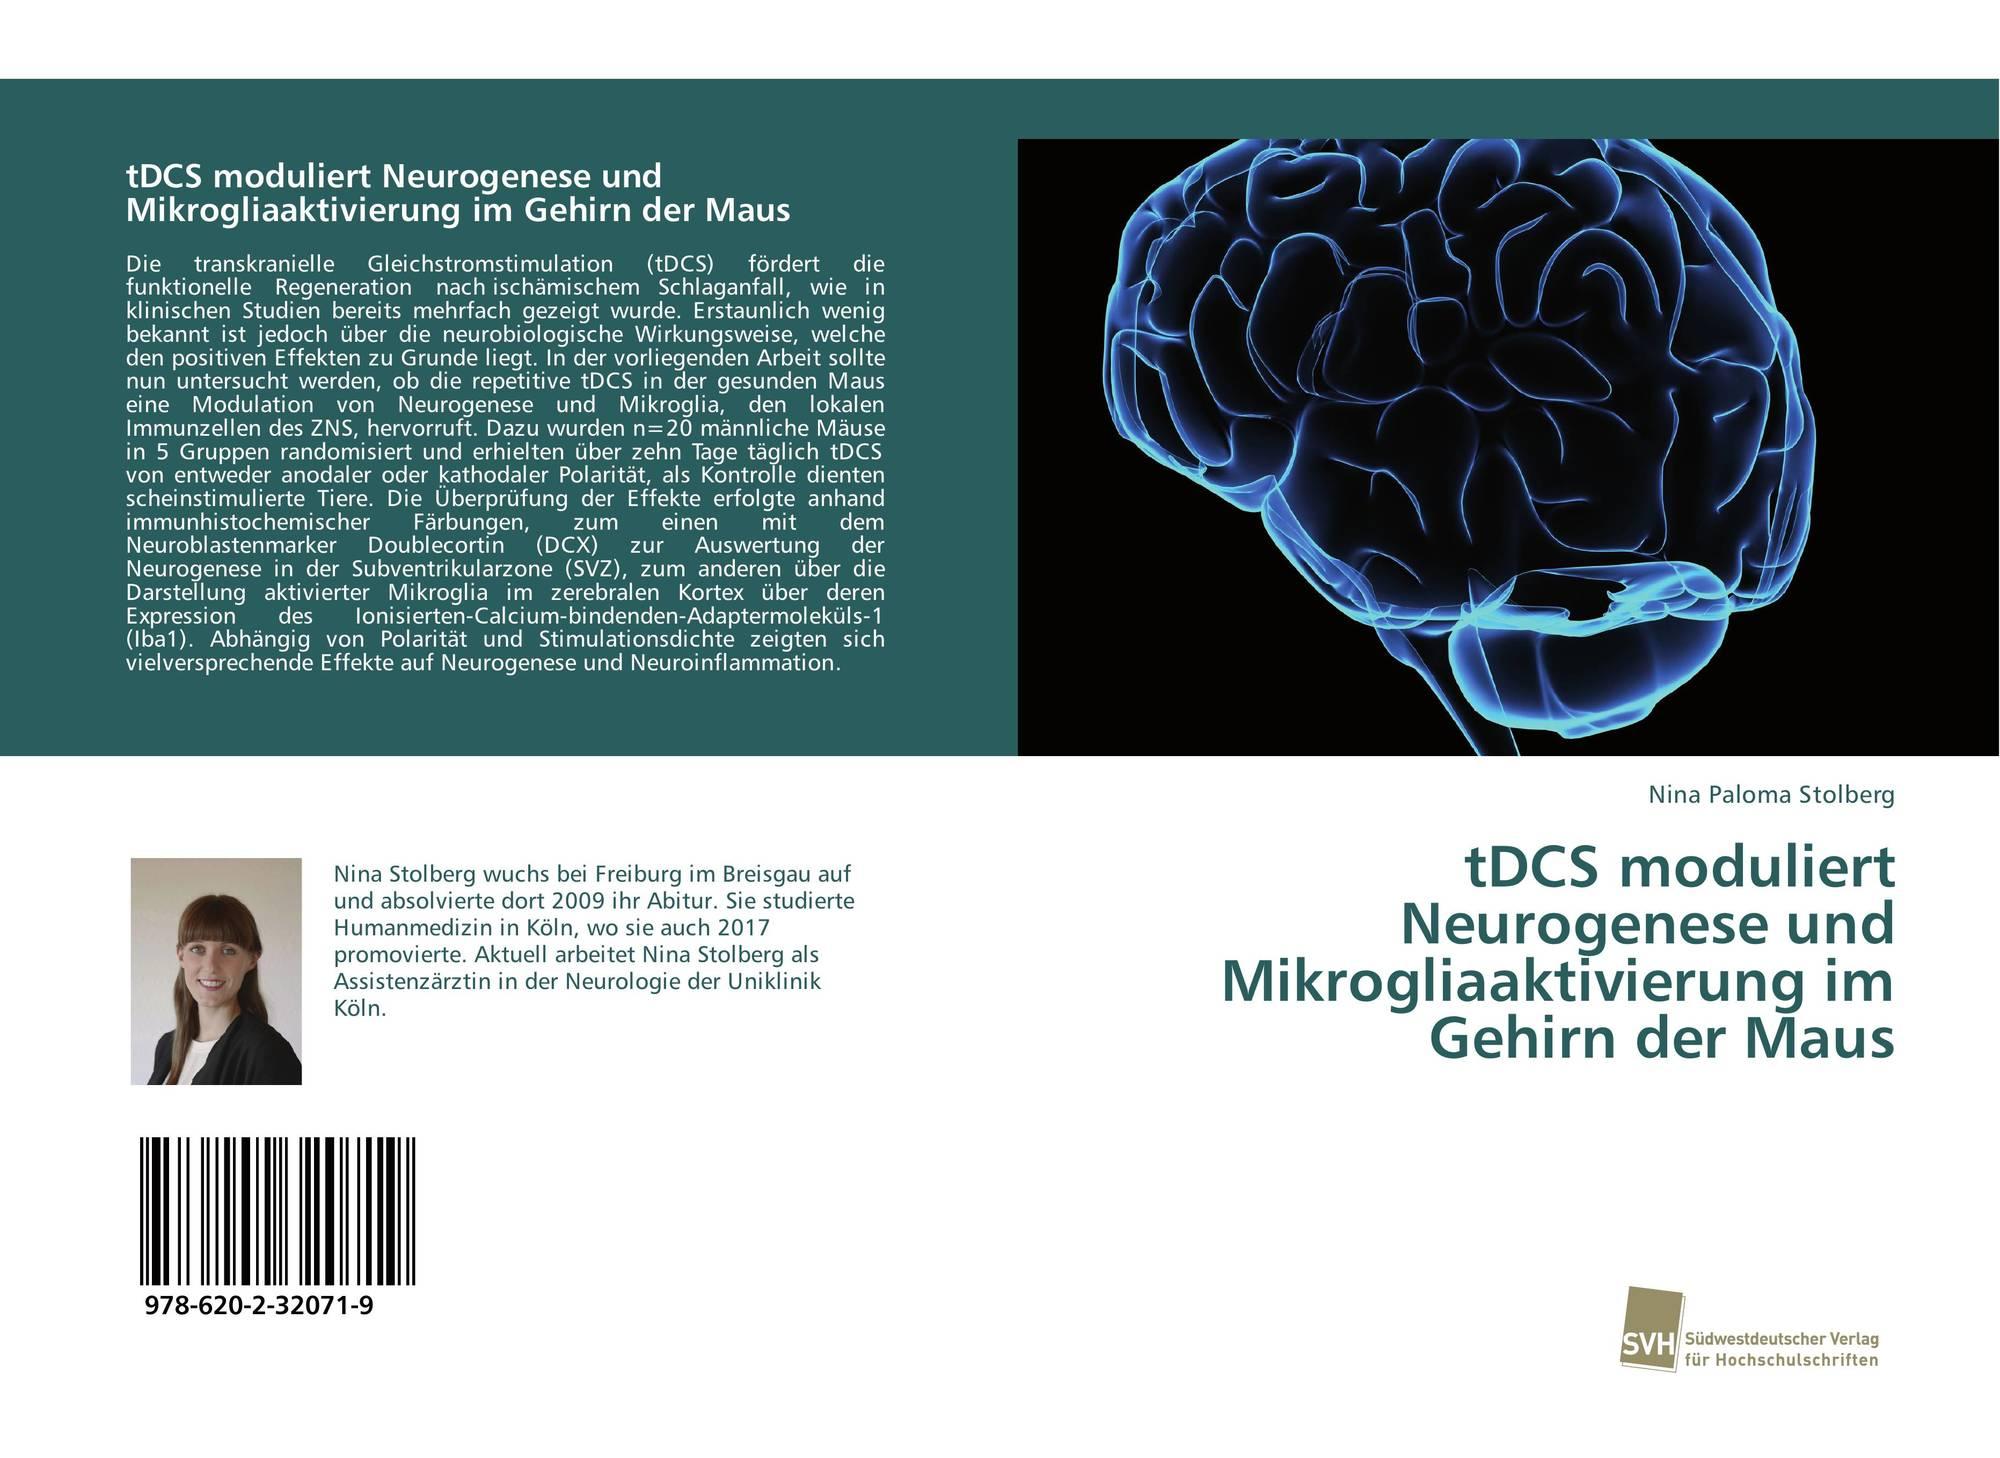 neurologe stolberg